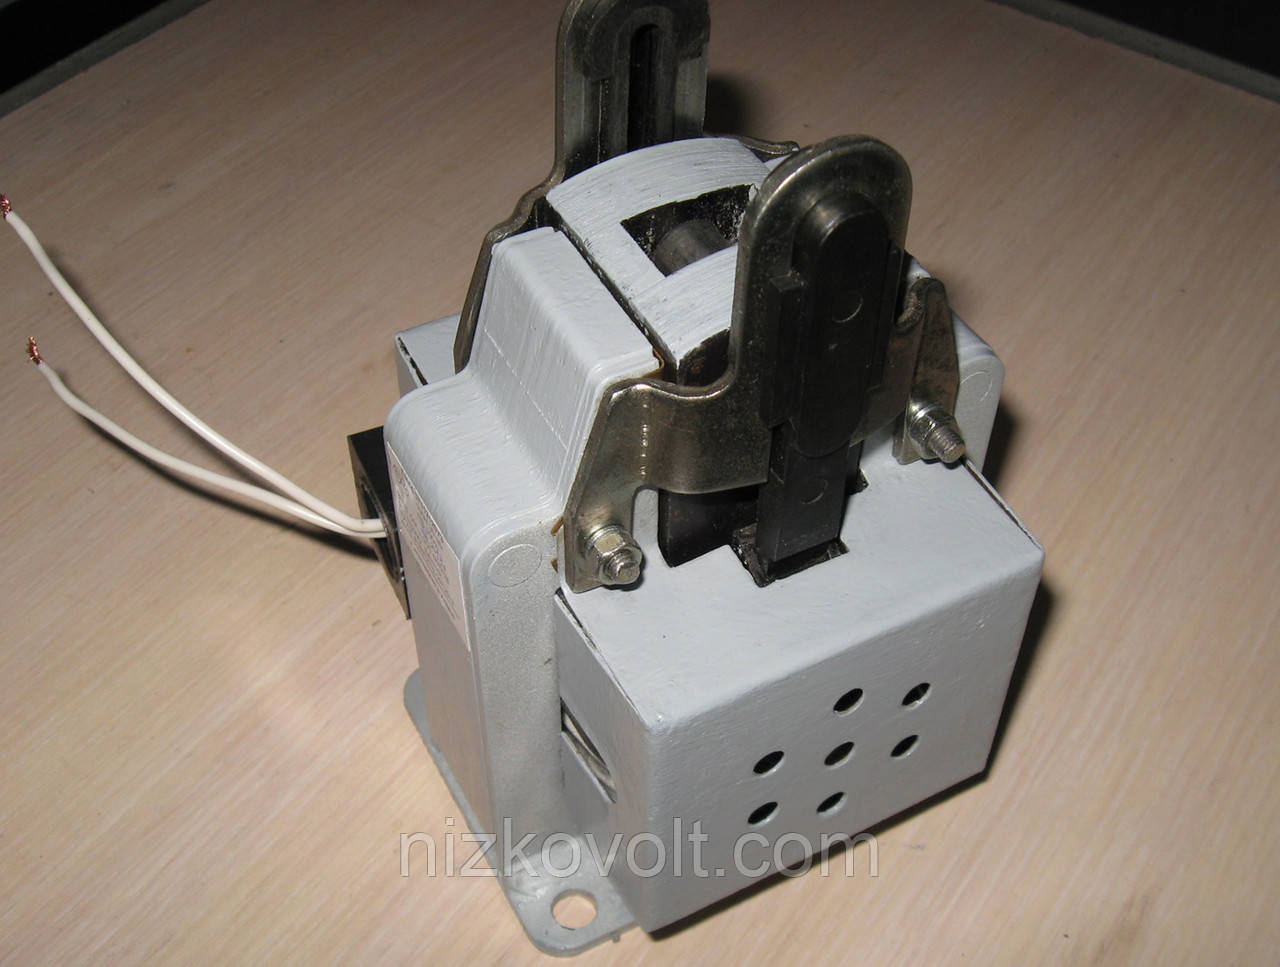 Низковольтная аппаратура «Электромагнит типа ЭМ 44-37-1321  (ТУ У 27.9-03972732-007:2013)»